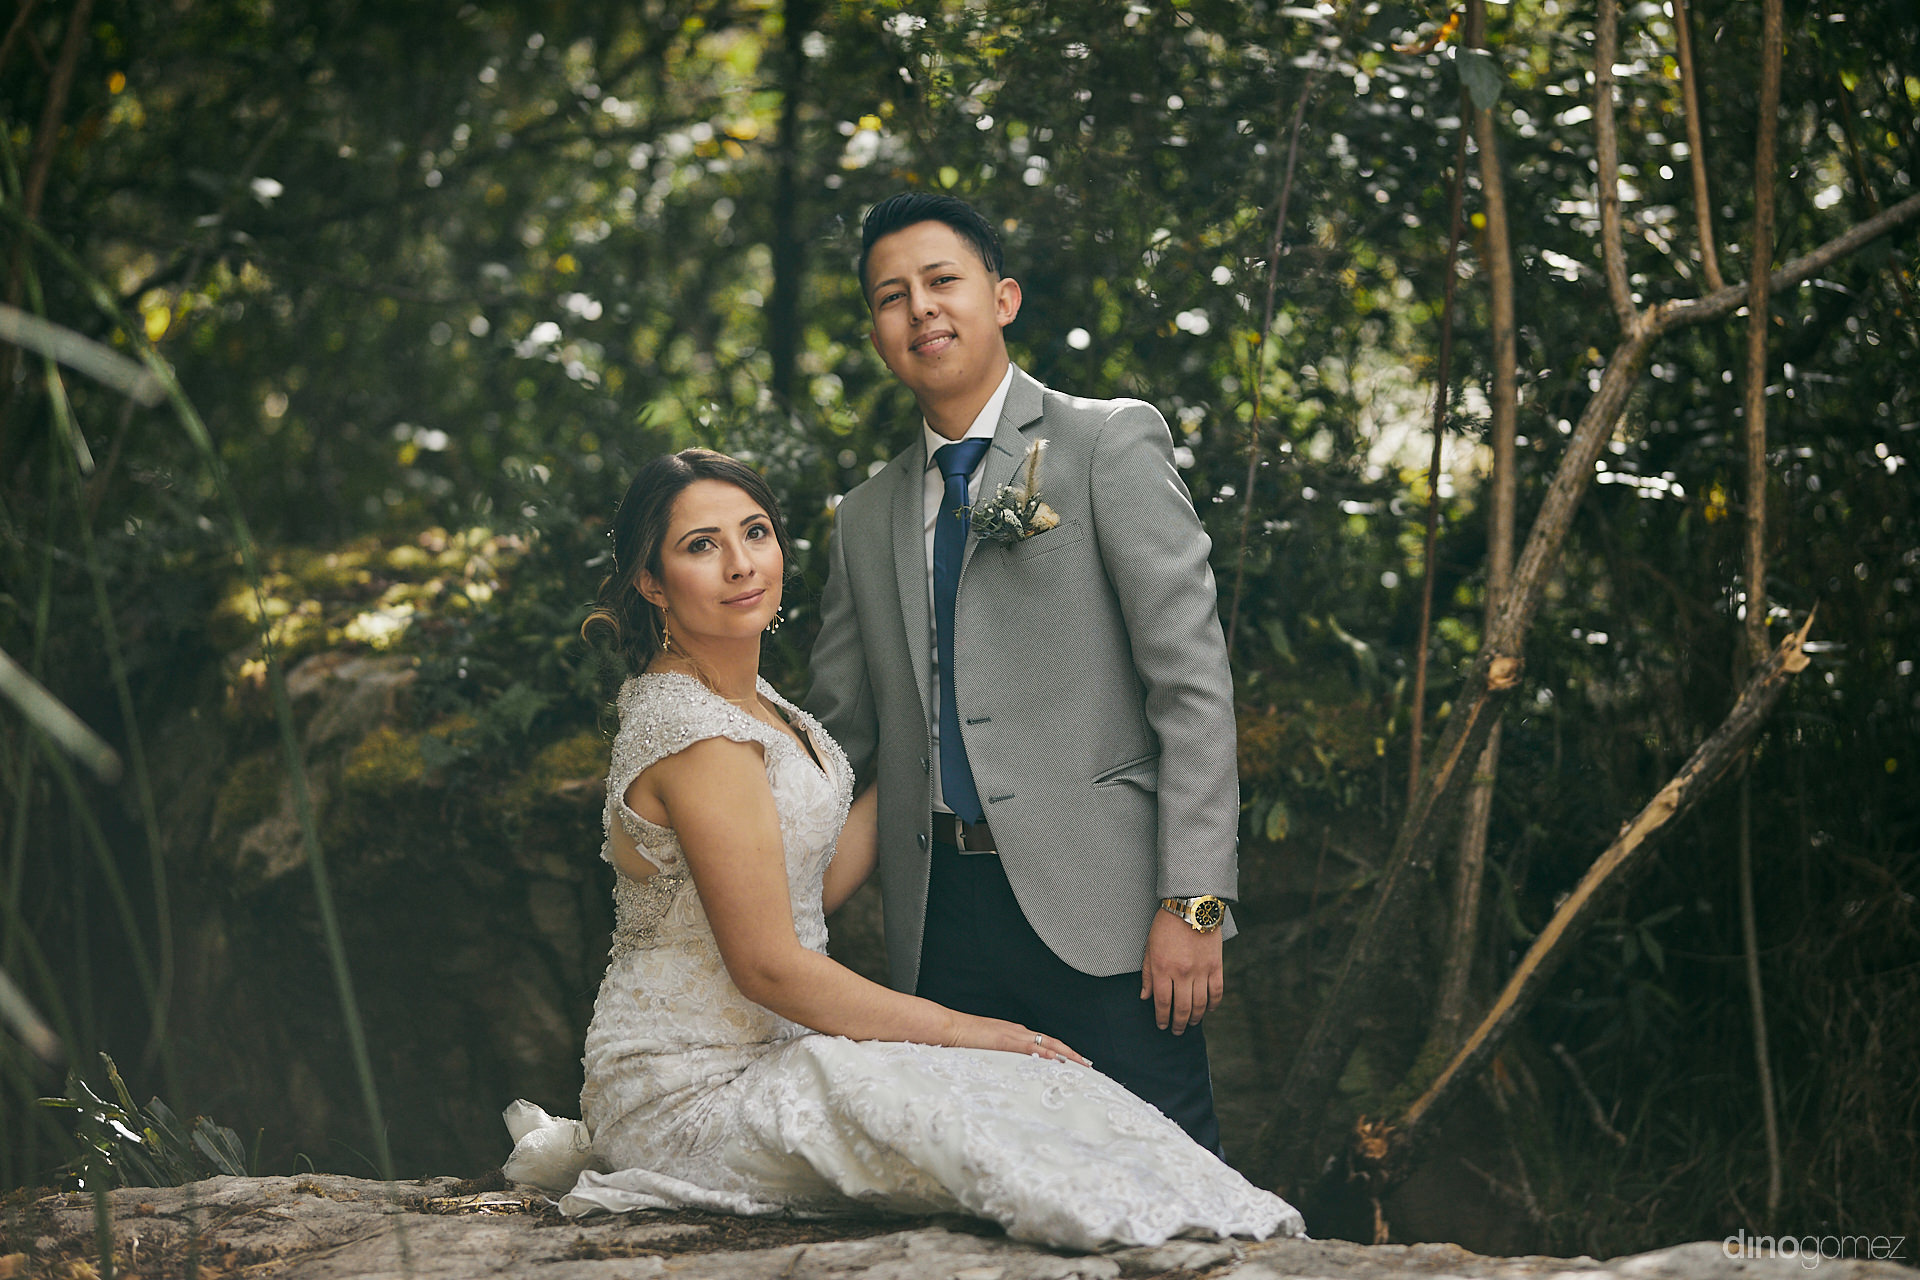 015 - Diy Budget Destination Weddings Can Be Prety Too!